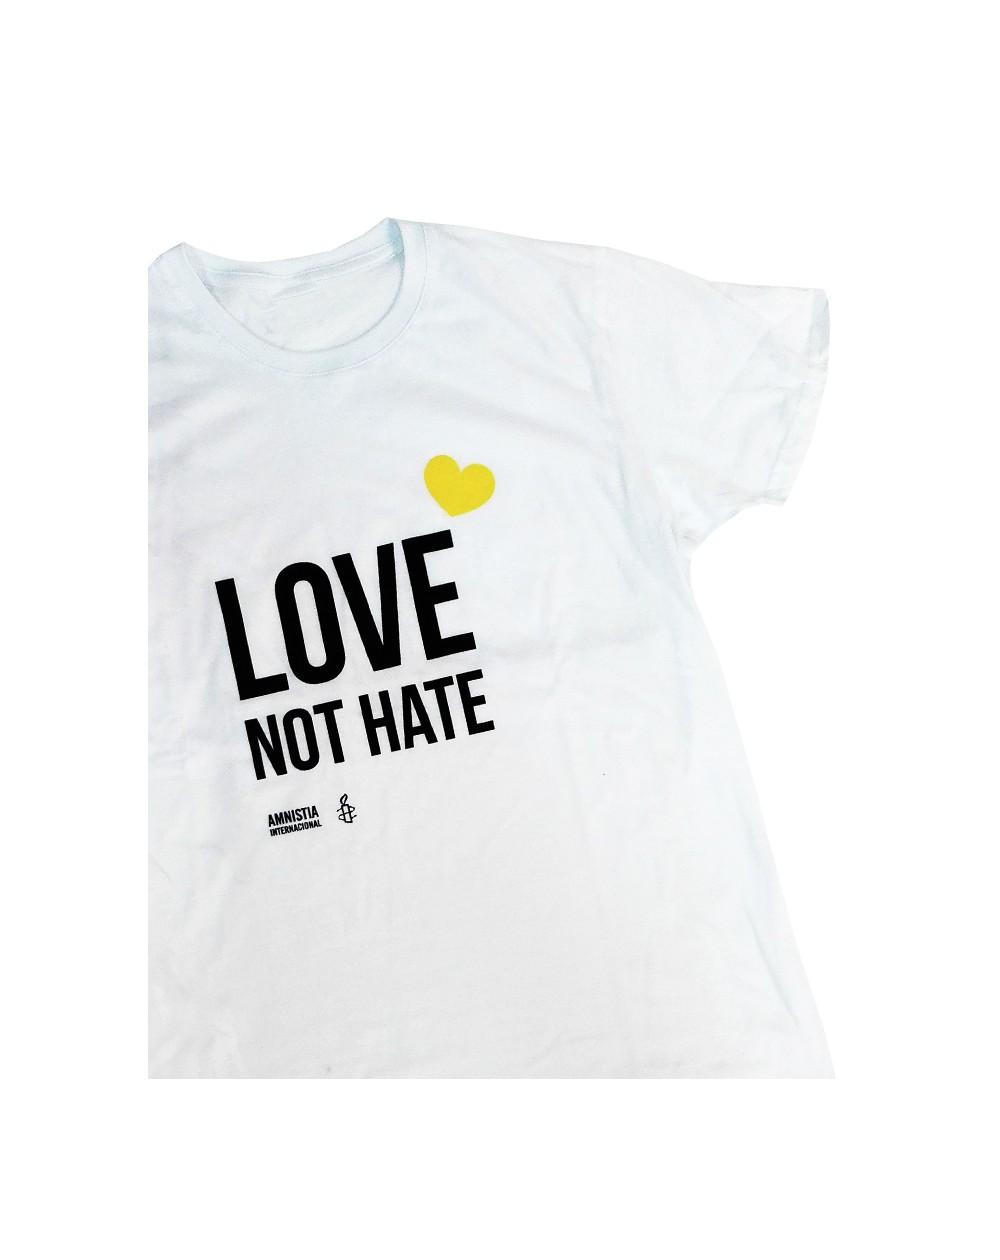 Camiseta orgullo LGTBI para chico Amnistía Internacional